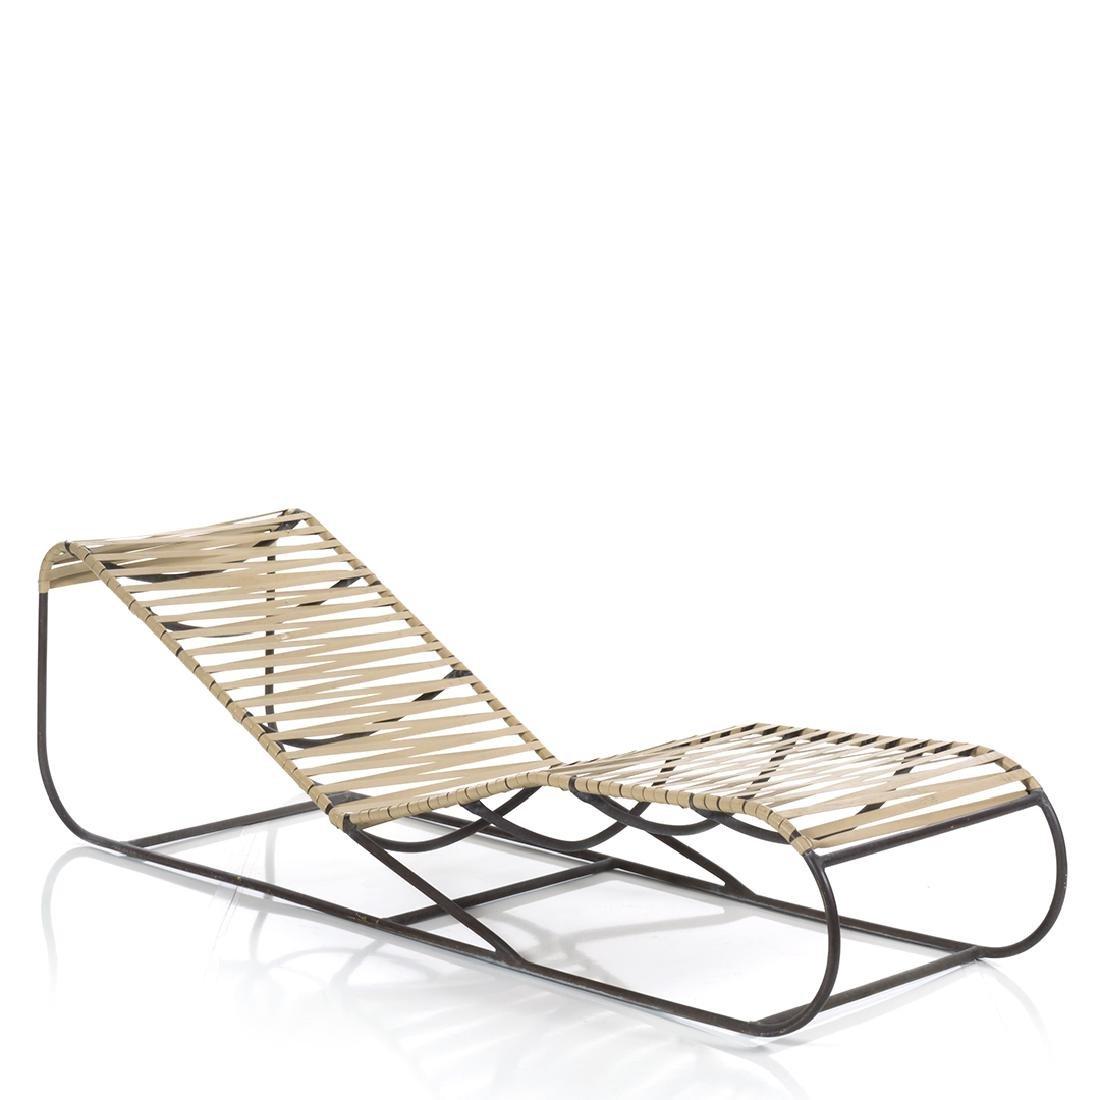 Kipp Stewart Bronze Chaise Lounges (2) - 4